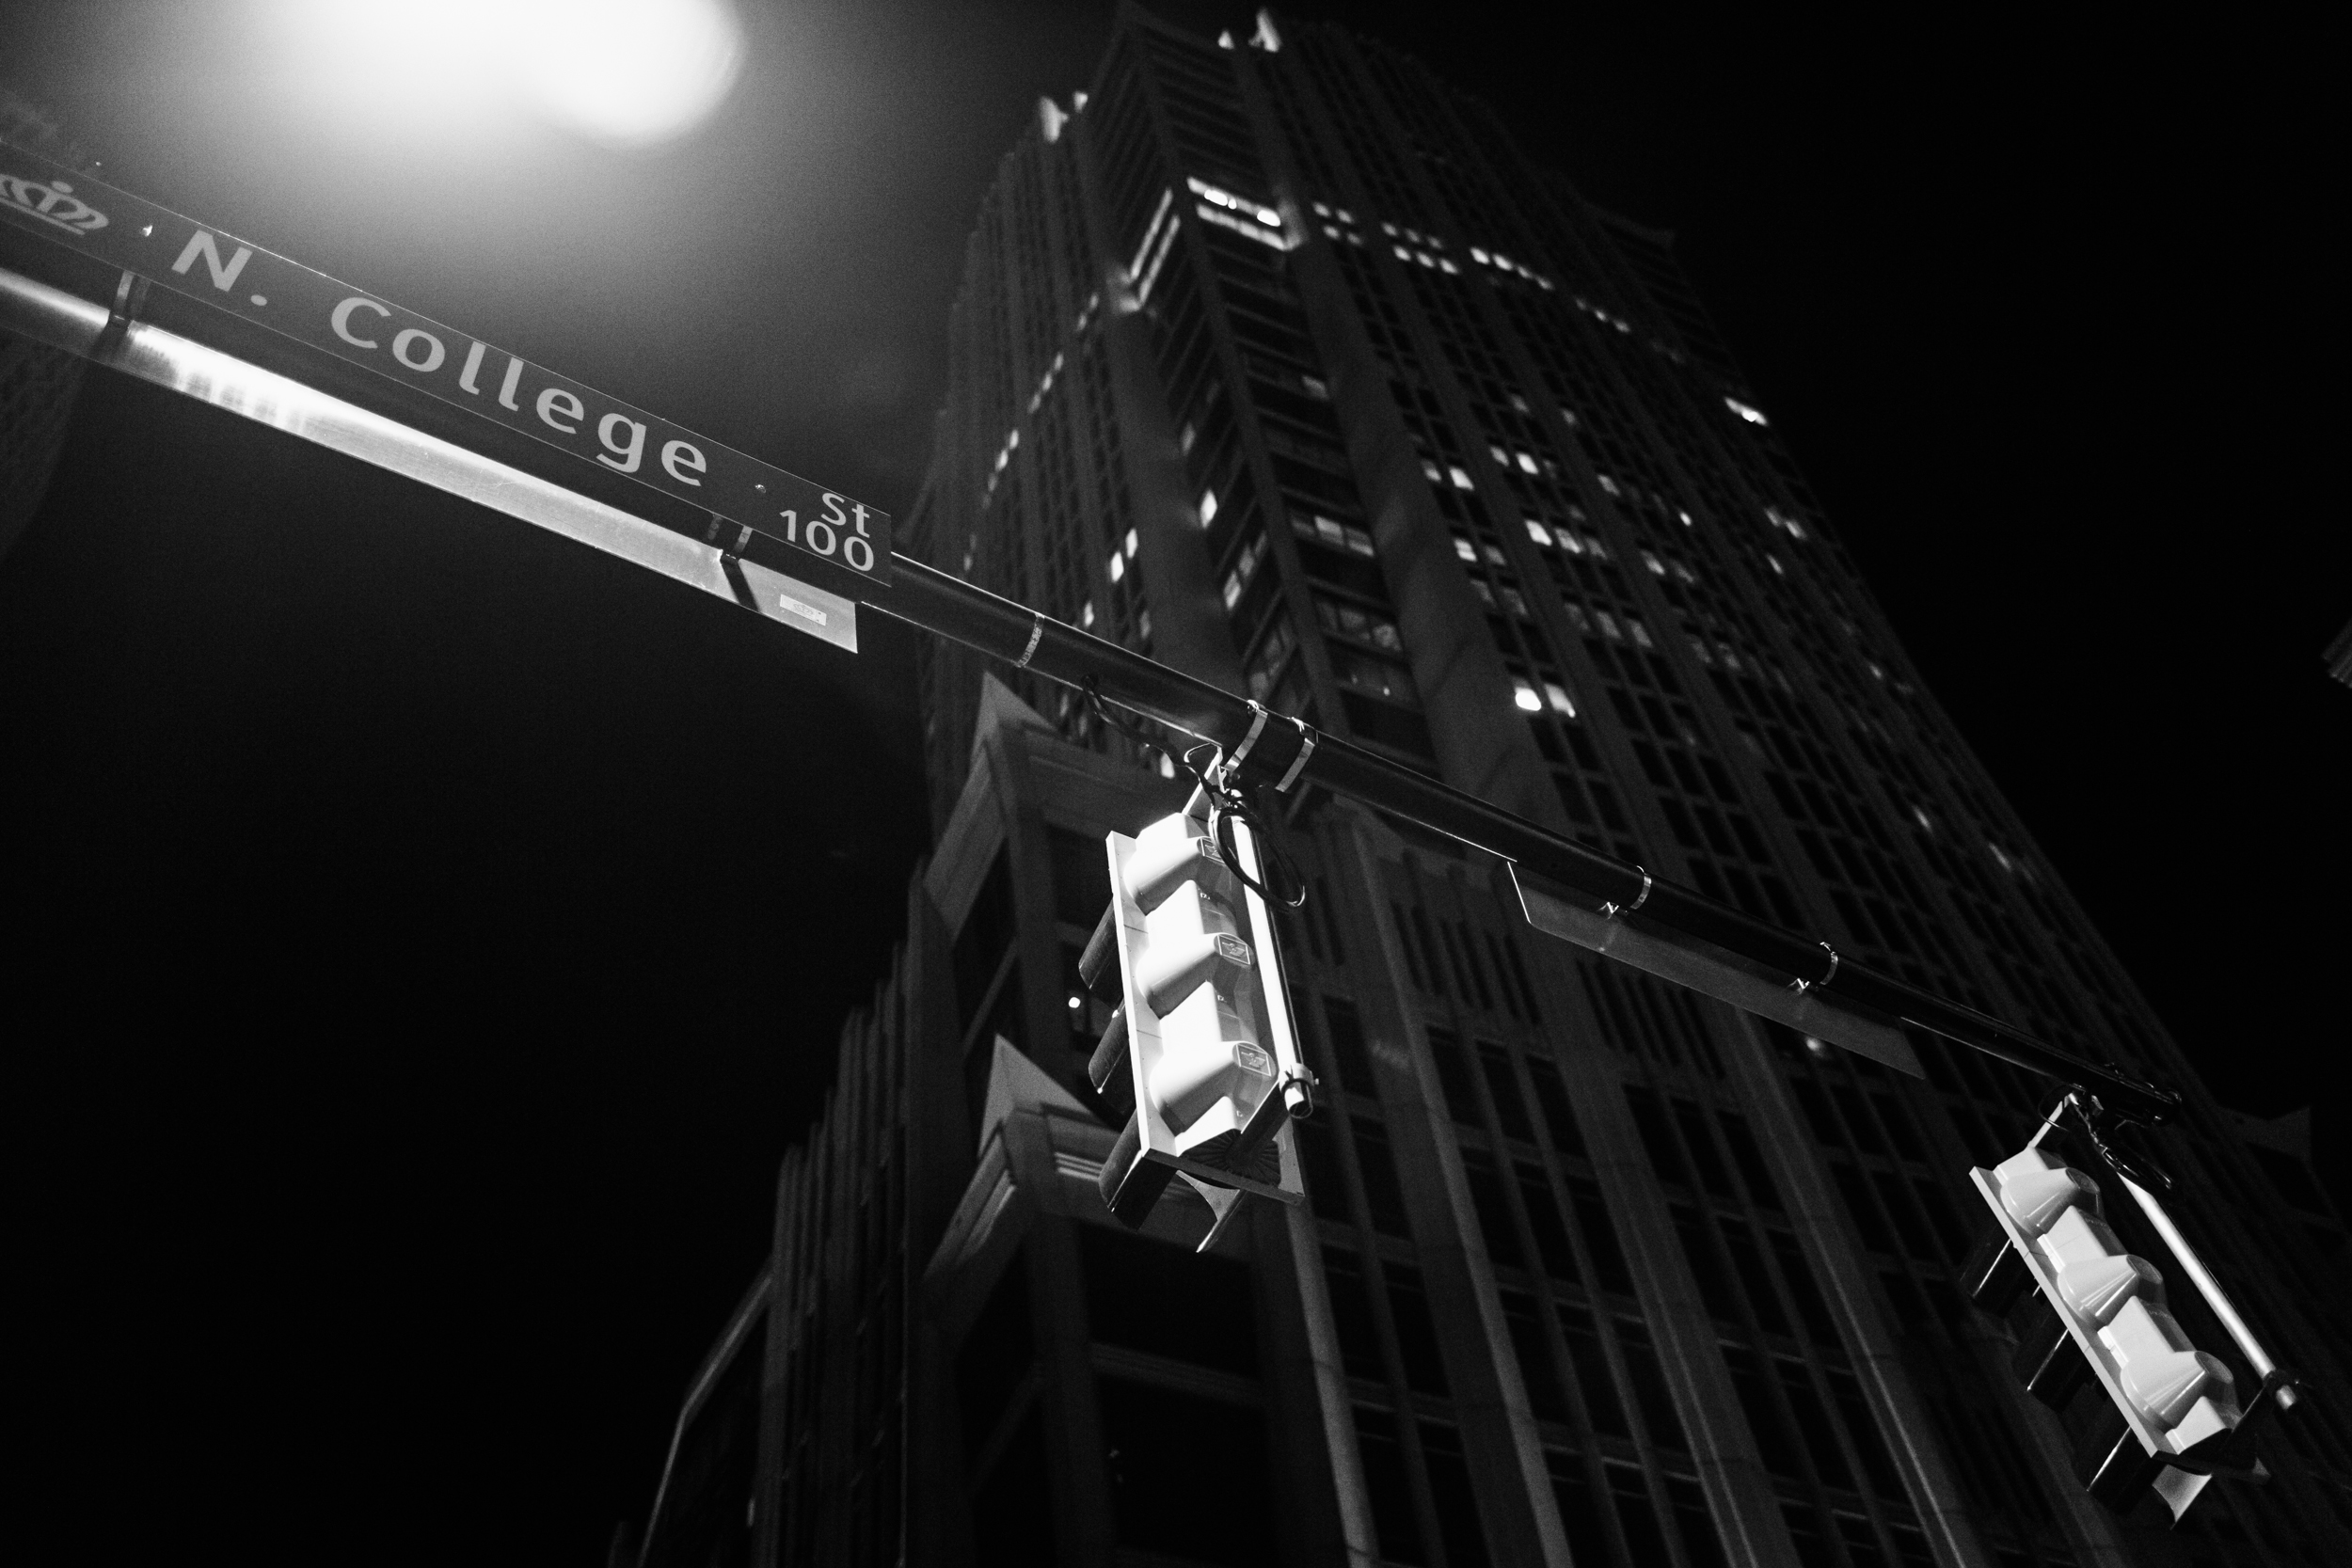 uptown_charlotte-23.jpg